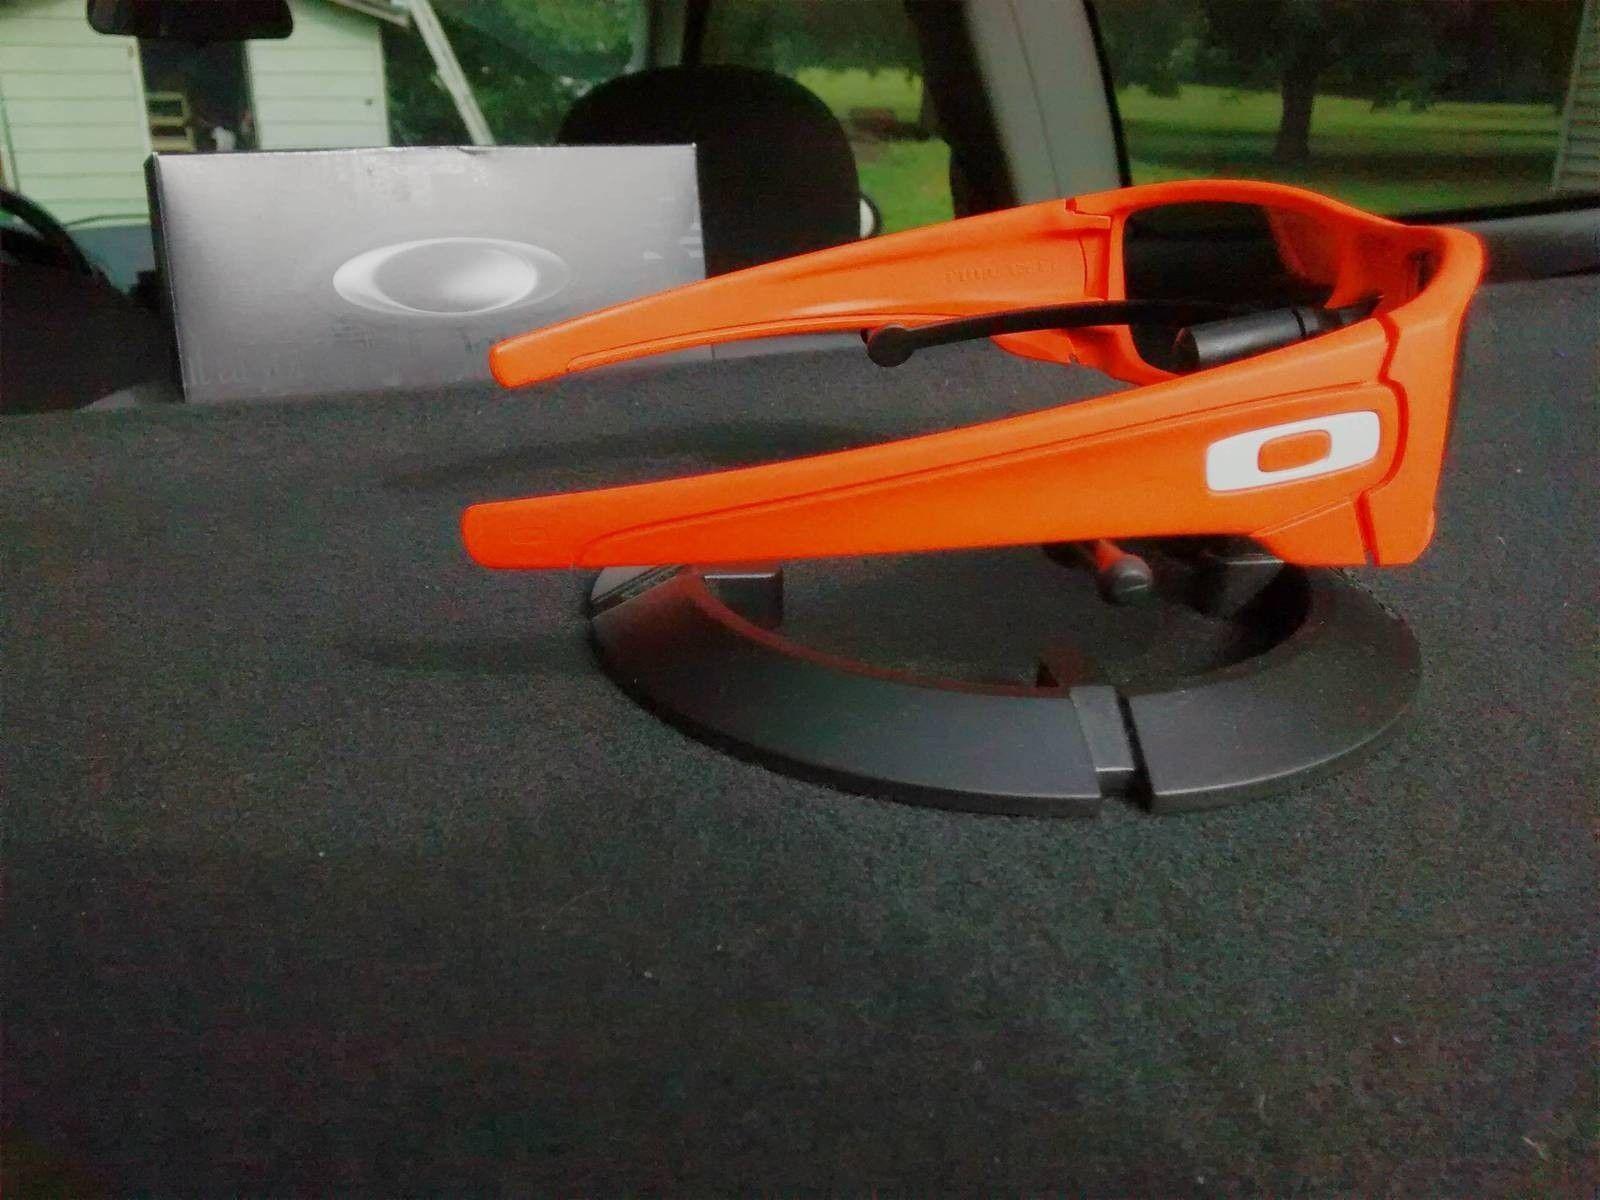 Safety Orange Fuel Cells With White Icons - Nx9YLtl.jpg